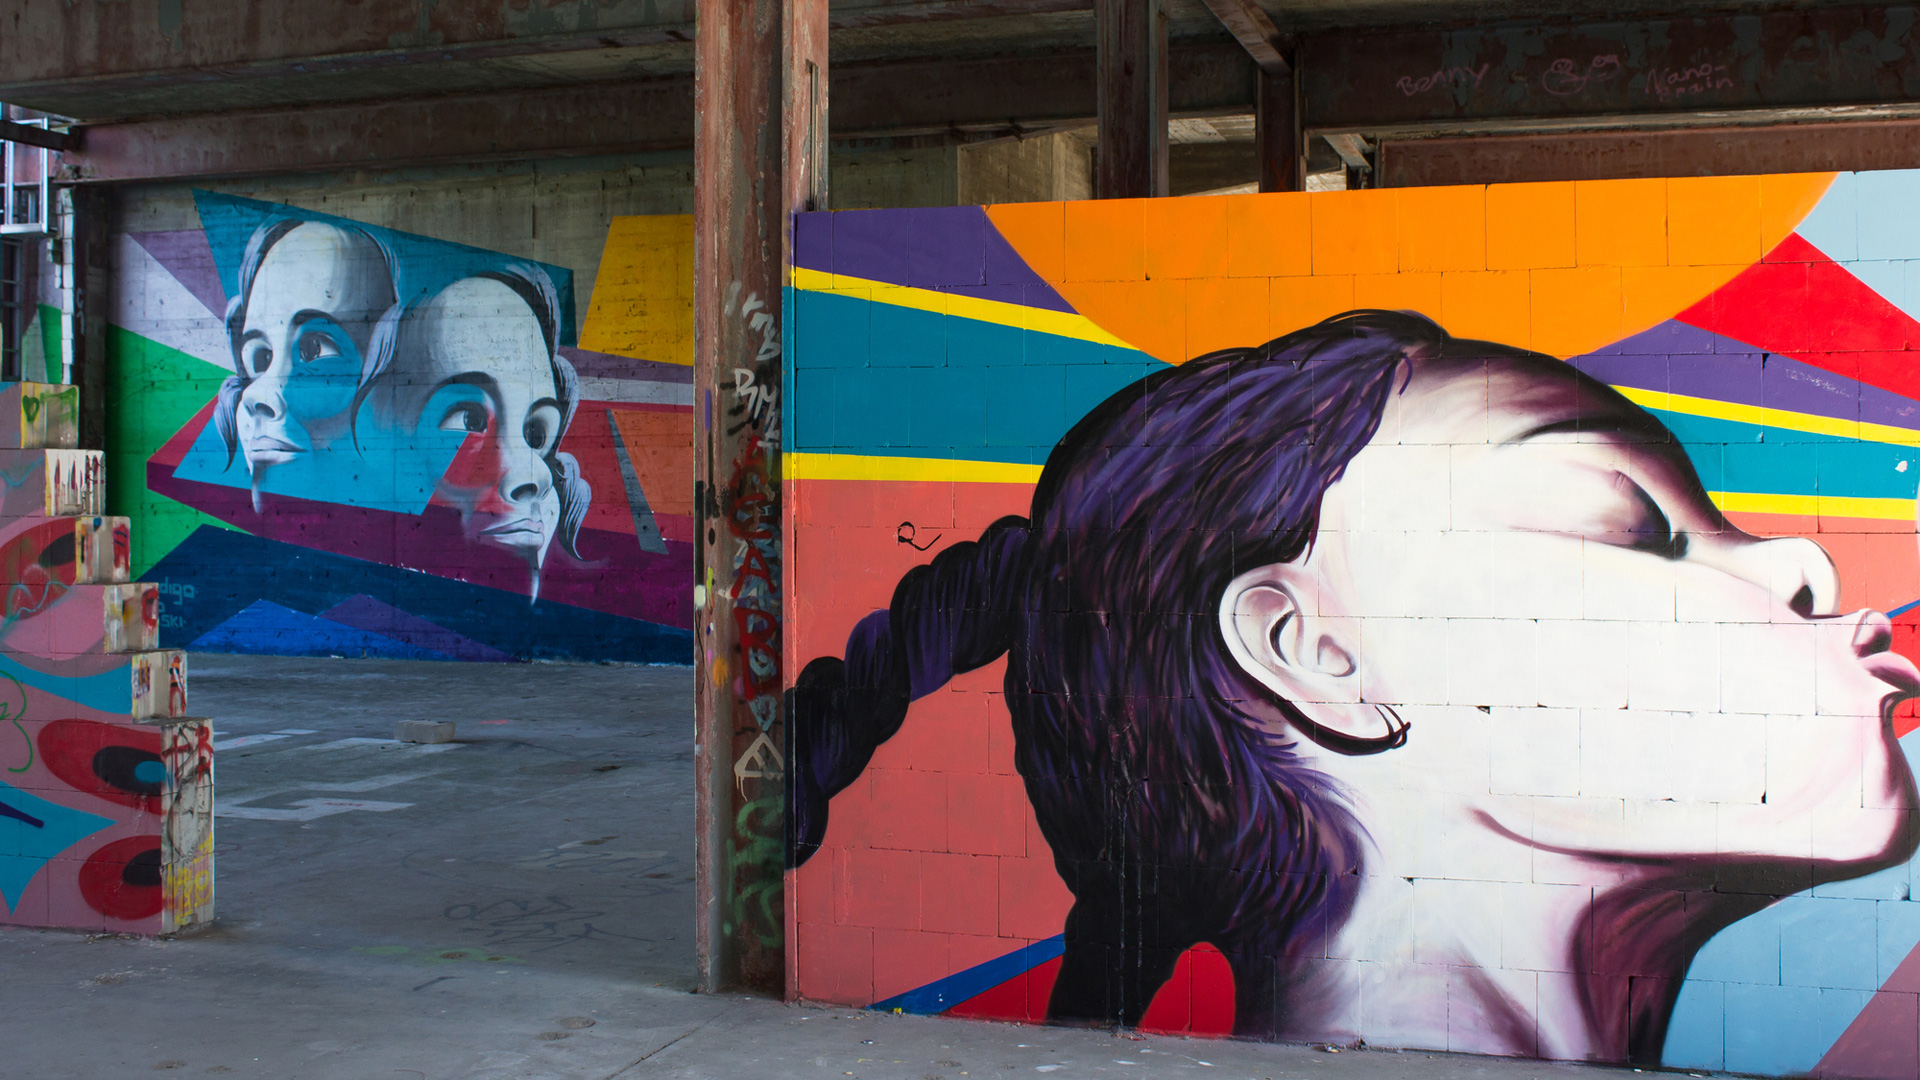 Gellert Malermeister Berlin - Wir bringen Farbe in Ihr Leben - Color Your Life